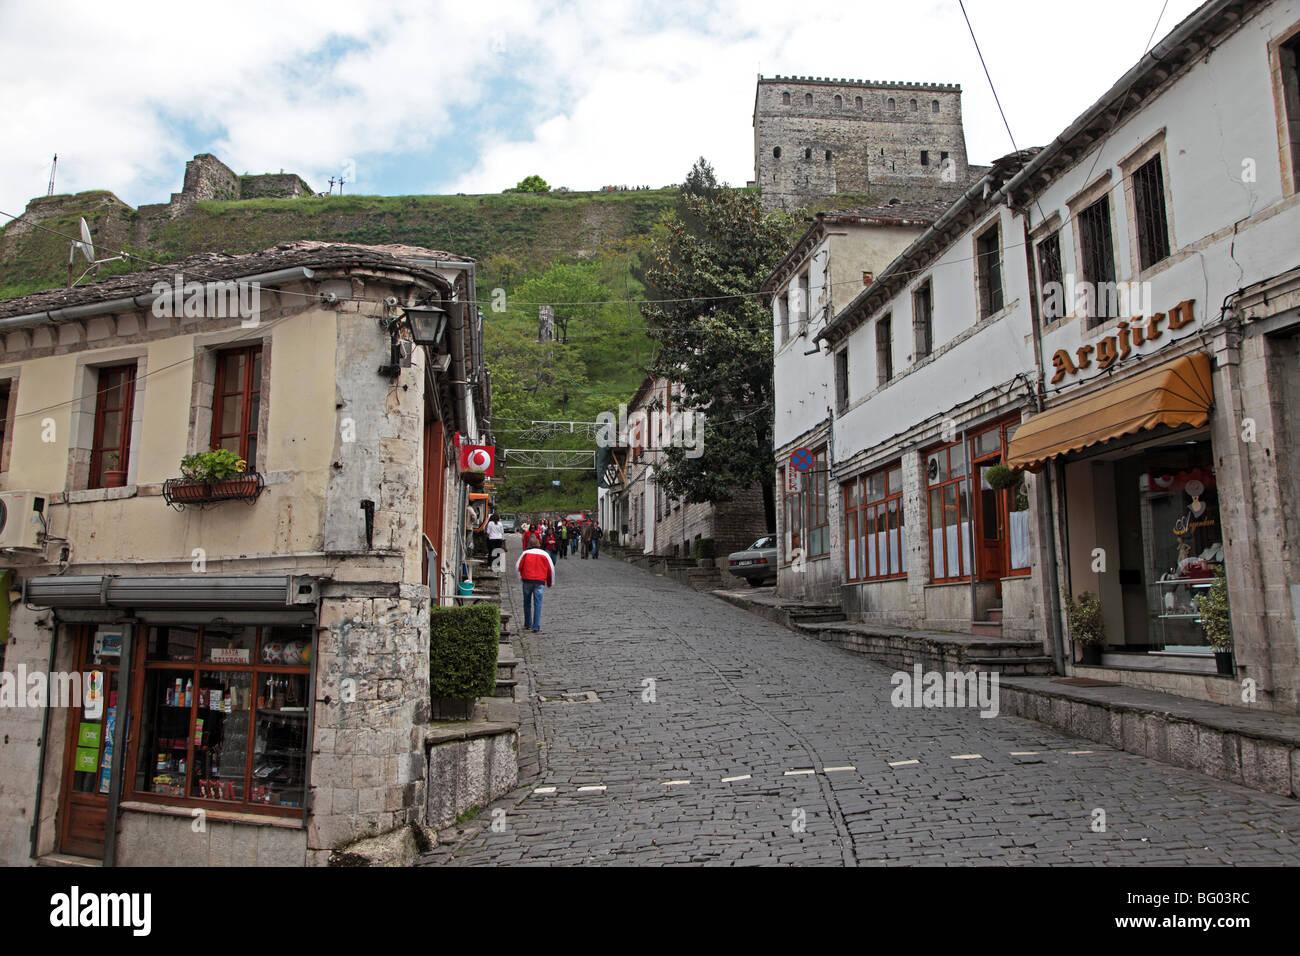 Old town of Gjirokastra, Albania - Stock Image